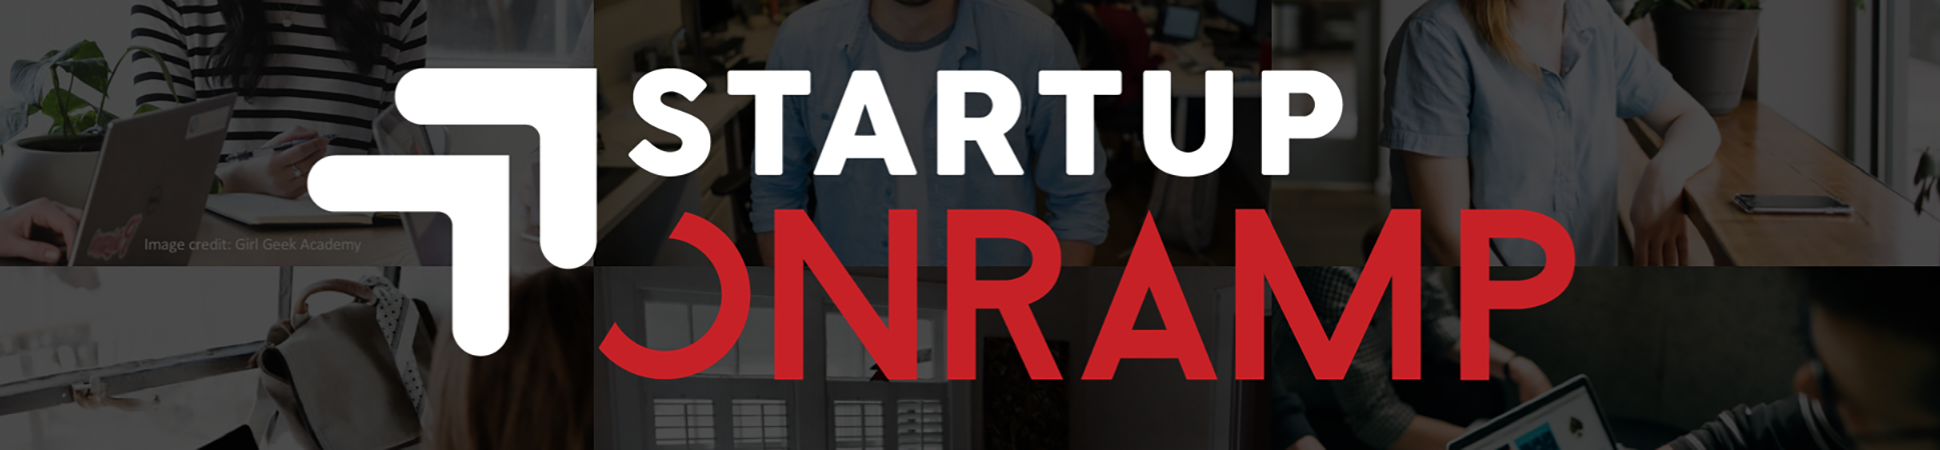 Startup Onramp banner image